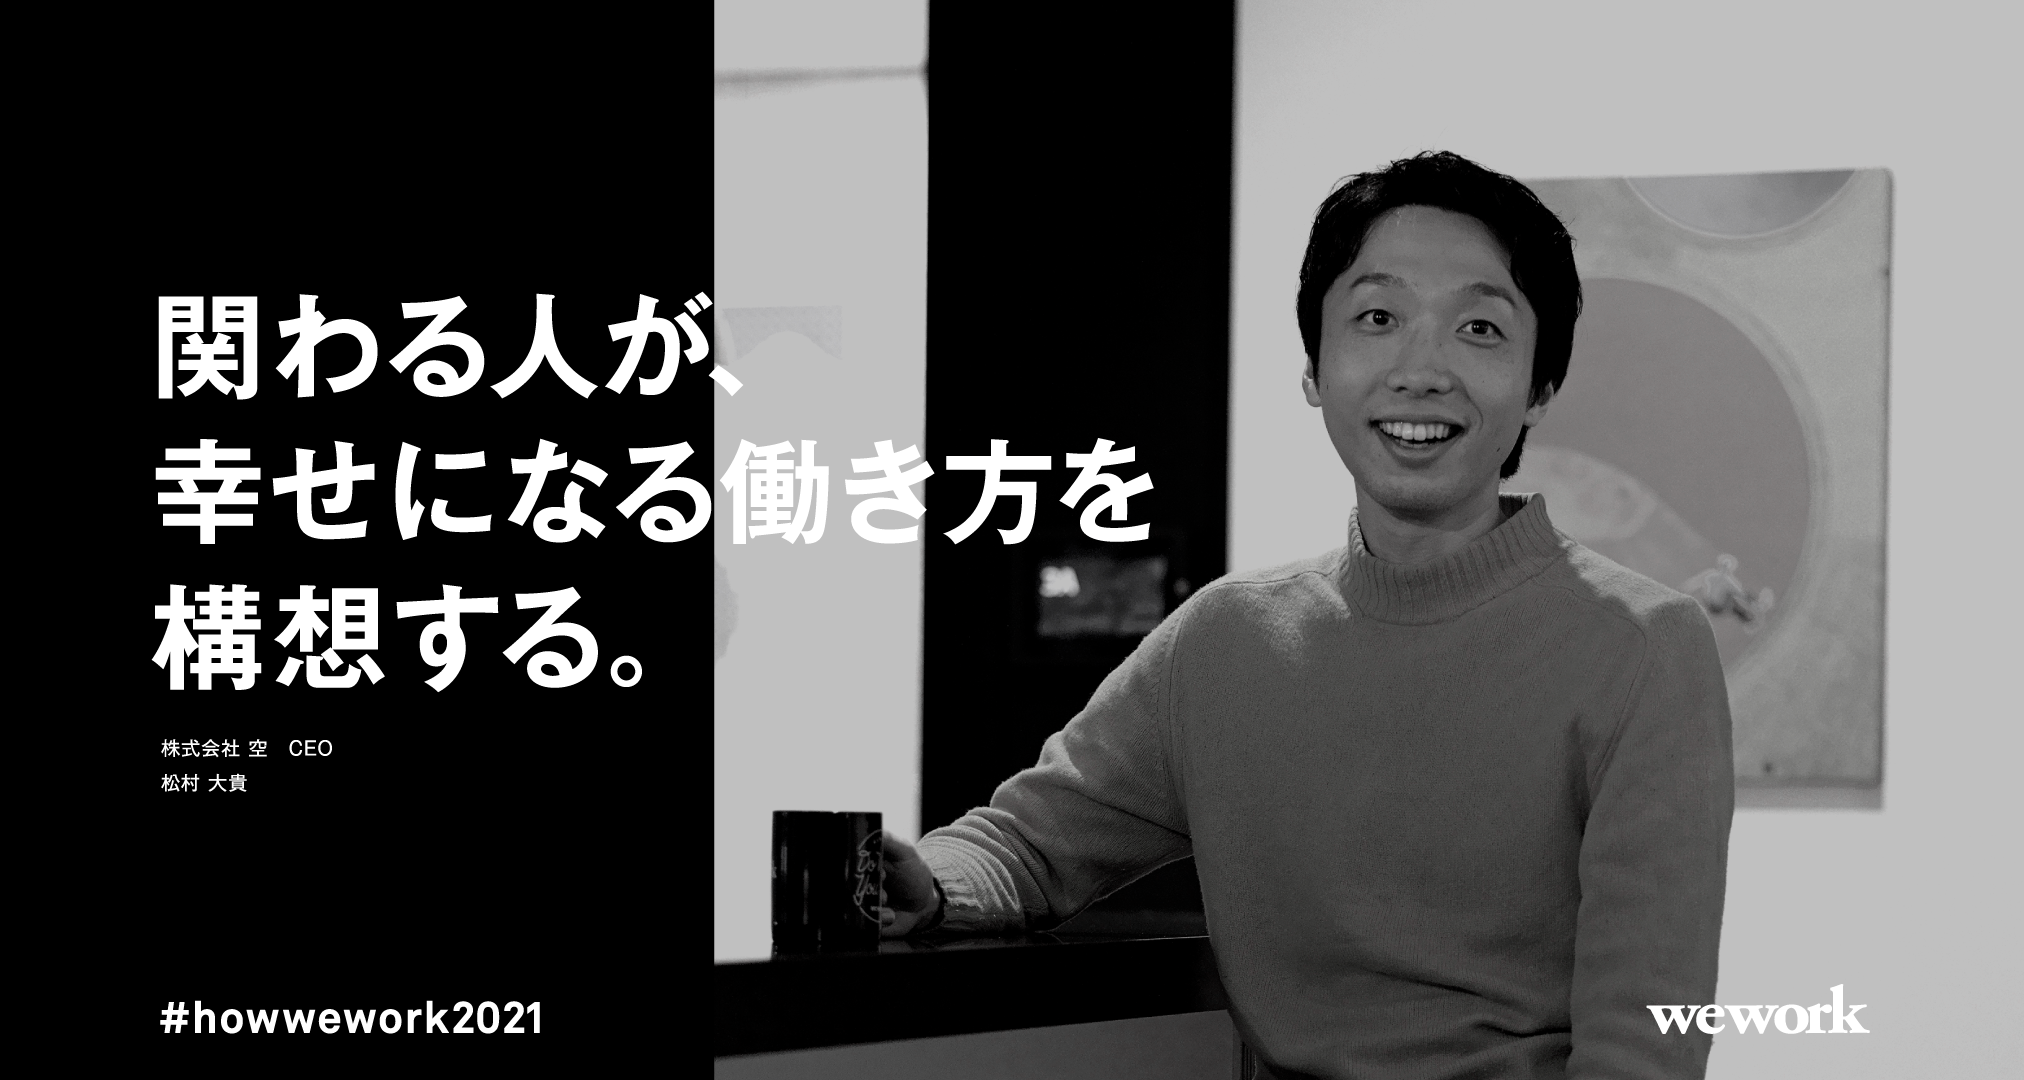 #howwework 松村さん